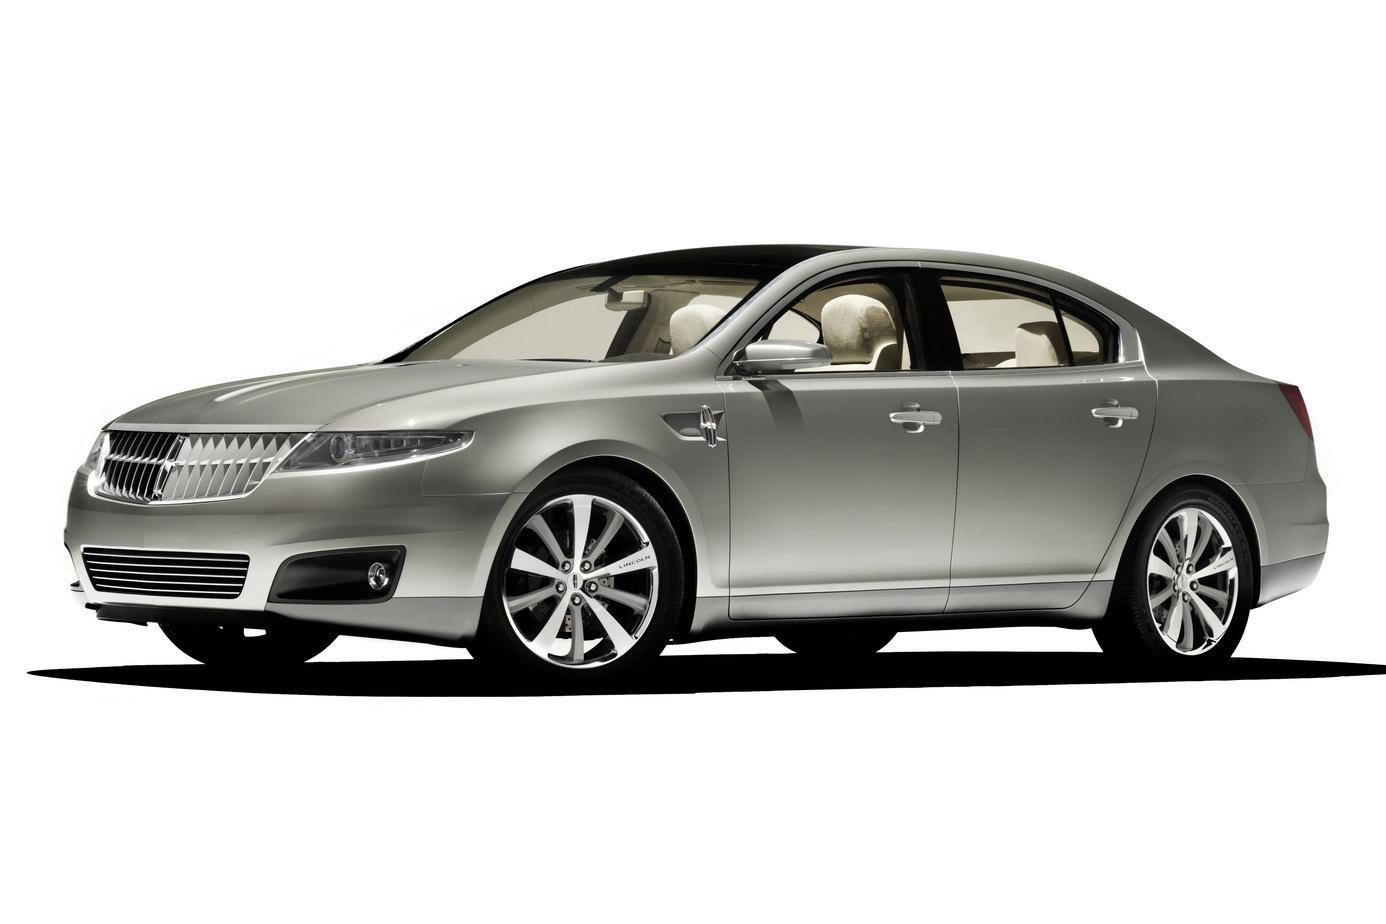 Lincoln Concept Models Navicross Aviator,MKS,Mark X, Mk 9 are under